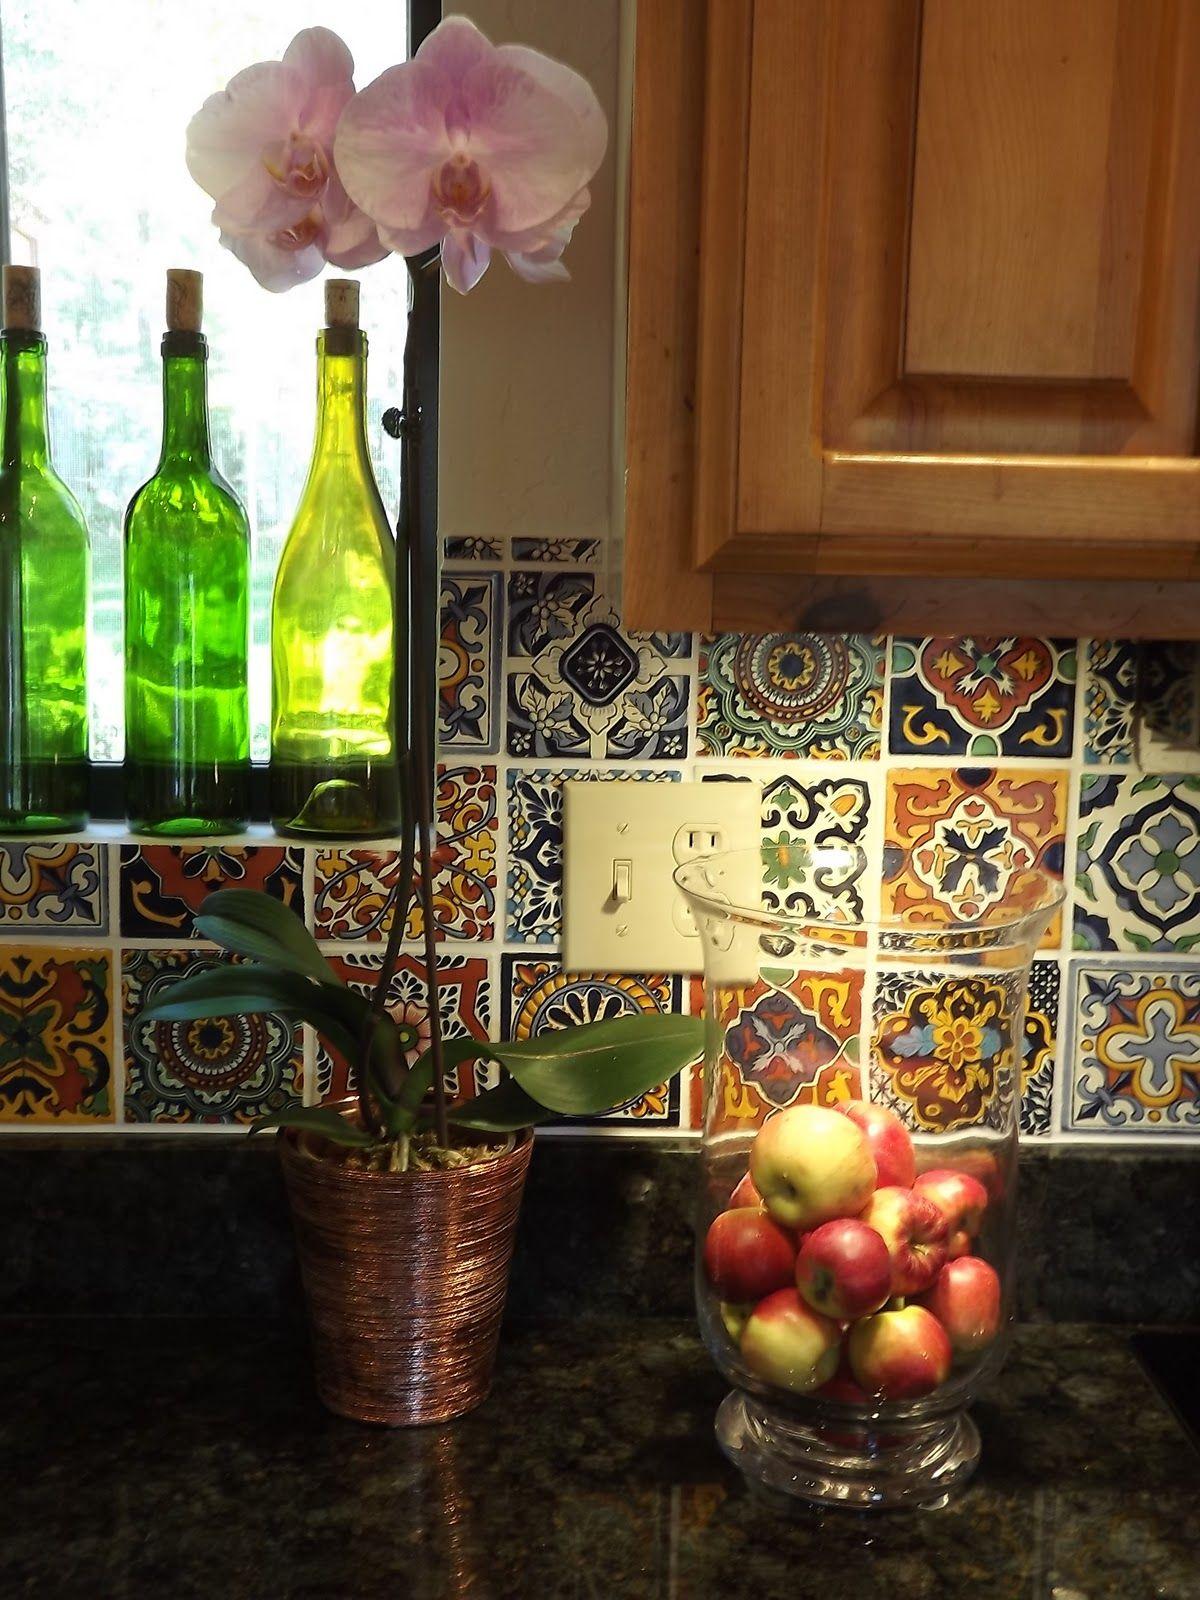 Mexican Tile Kitchen on Pinterest